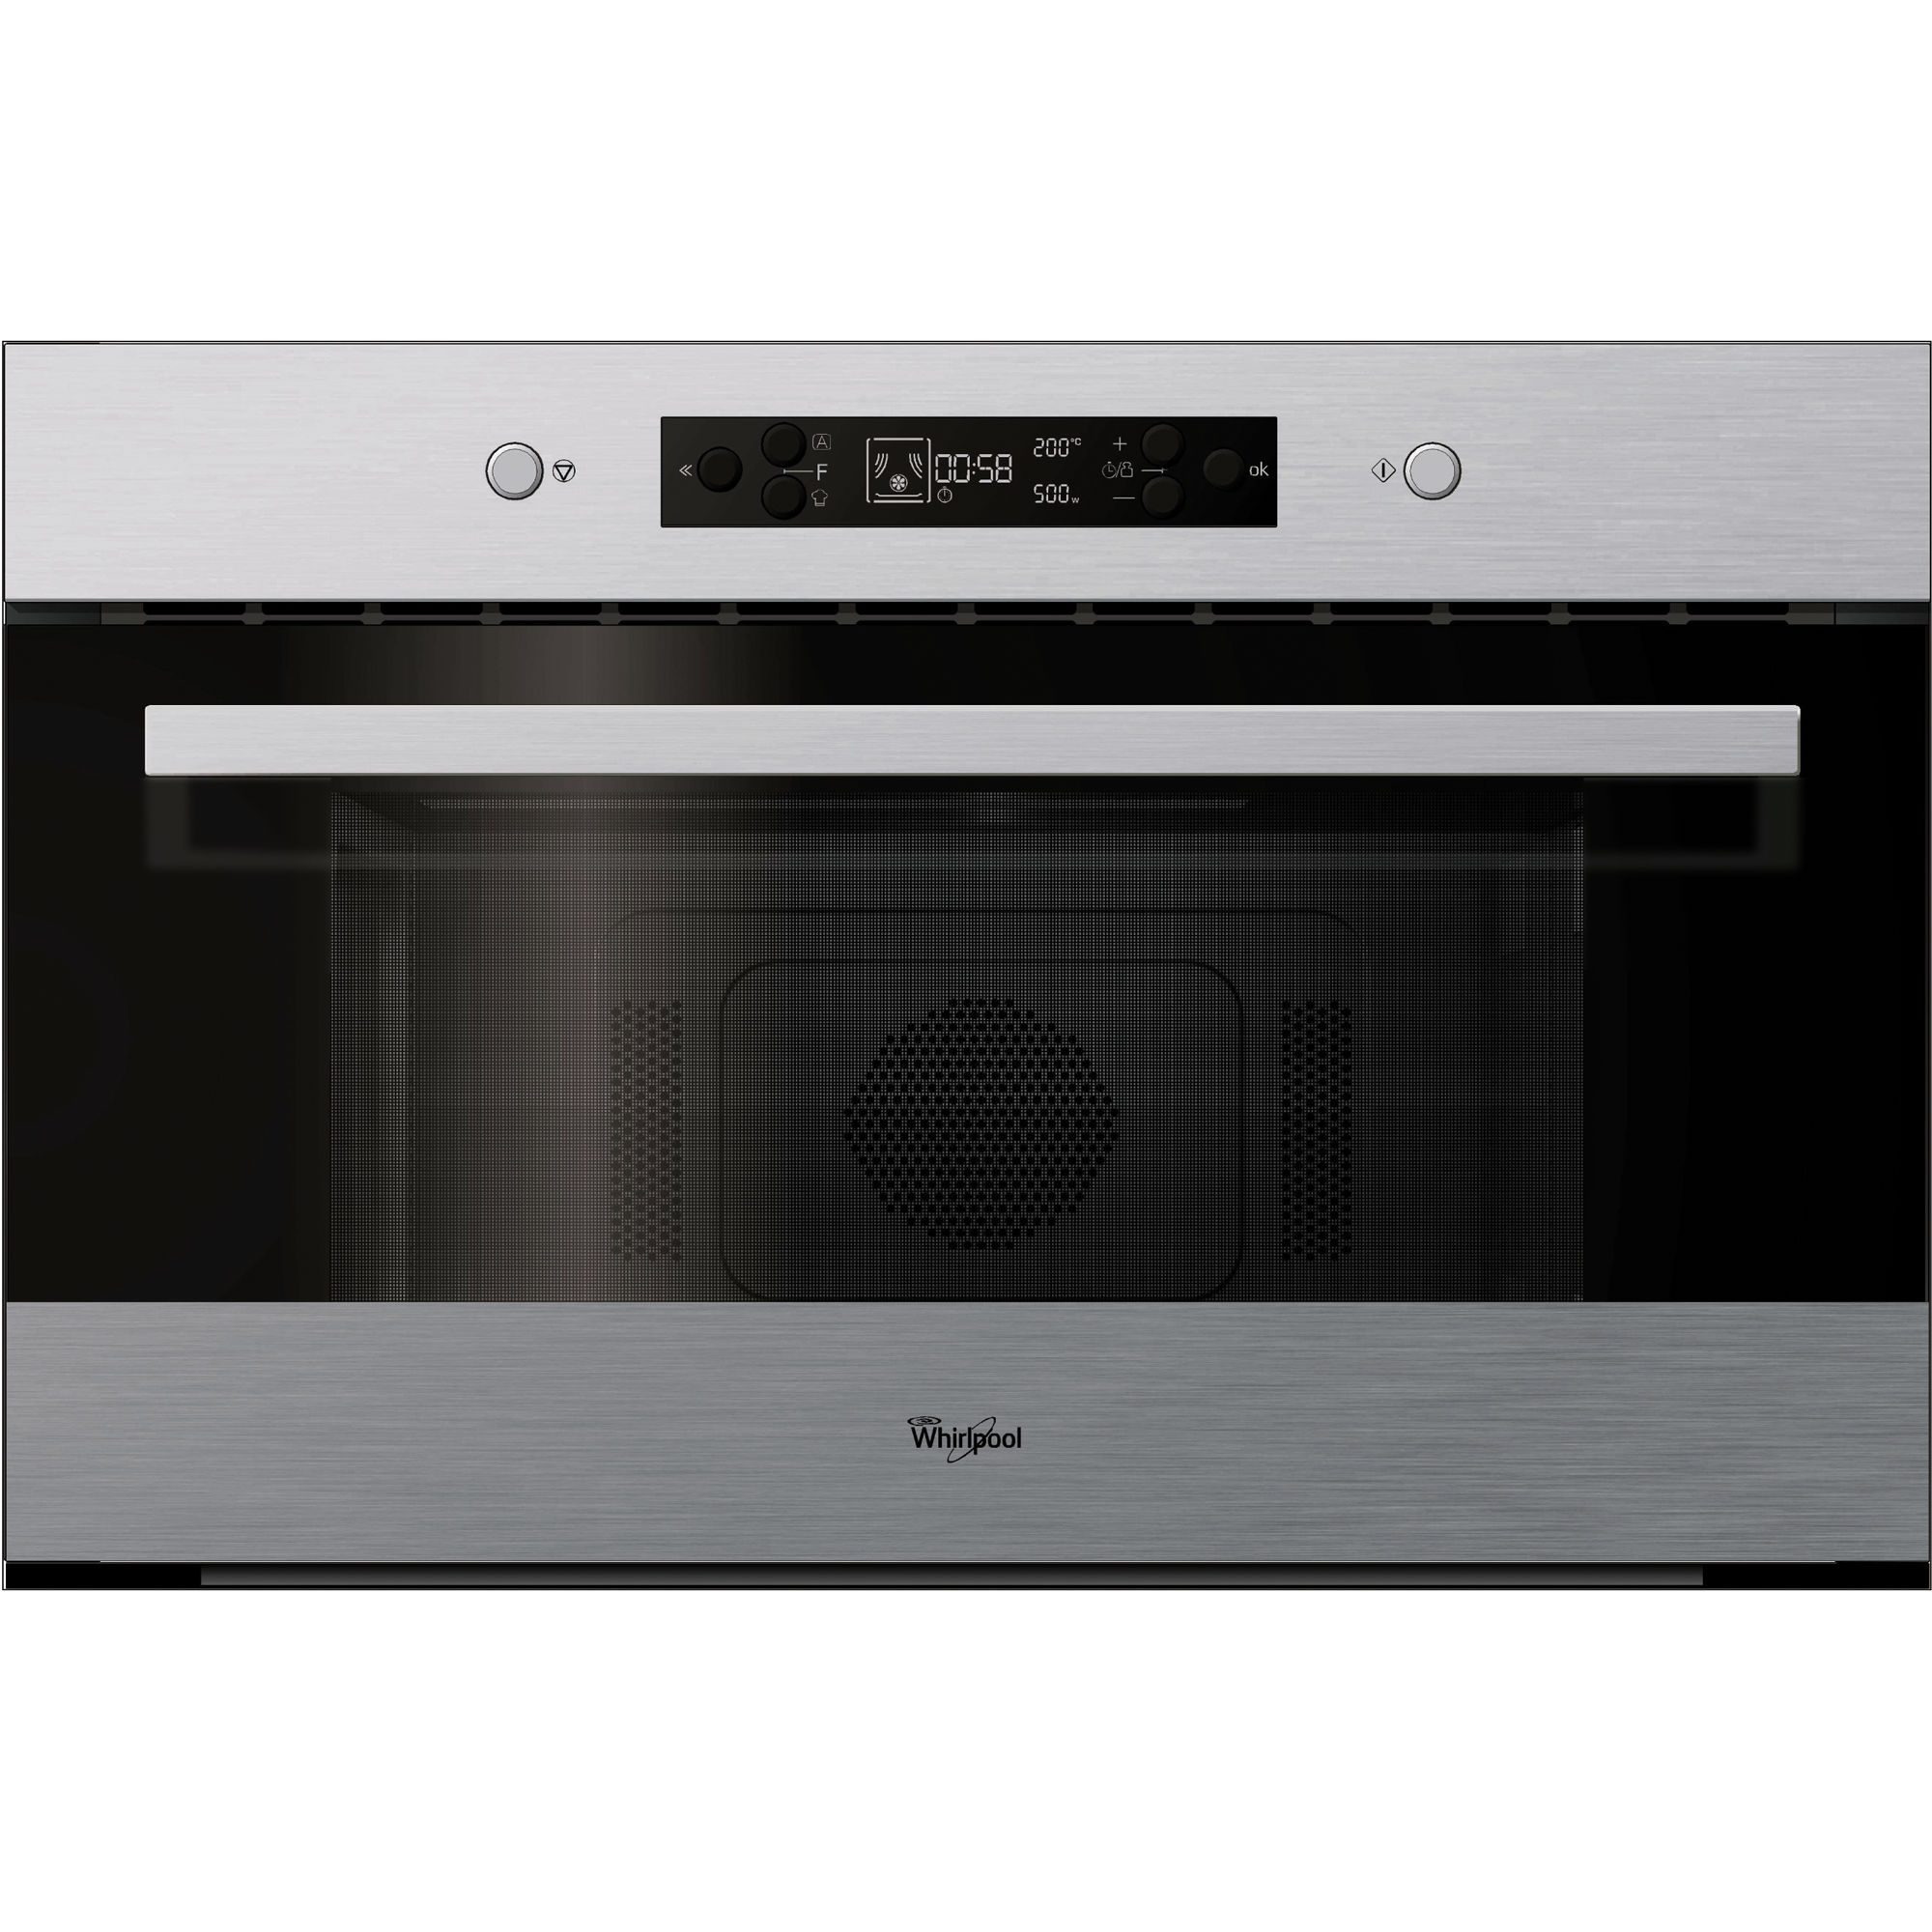 whirlpool amw 712 1 ix small household appliances appliances online shop. Black Bedroom Furniture Sets. Home Design Ideas